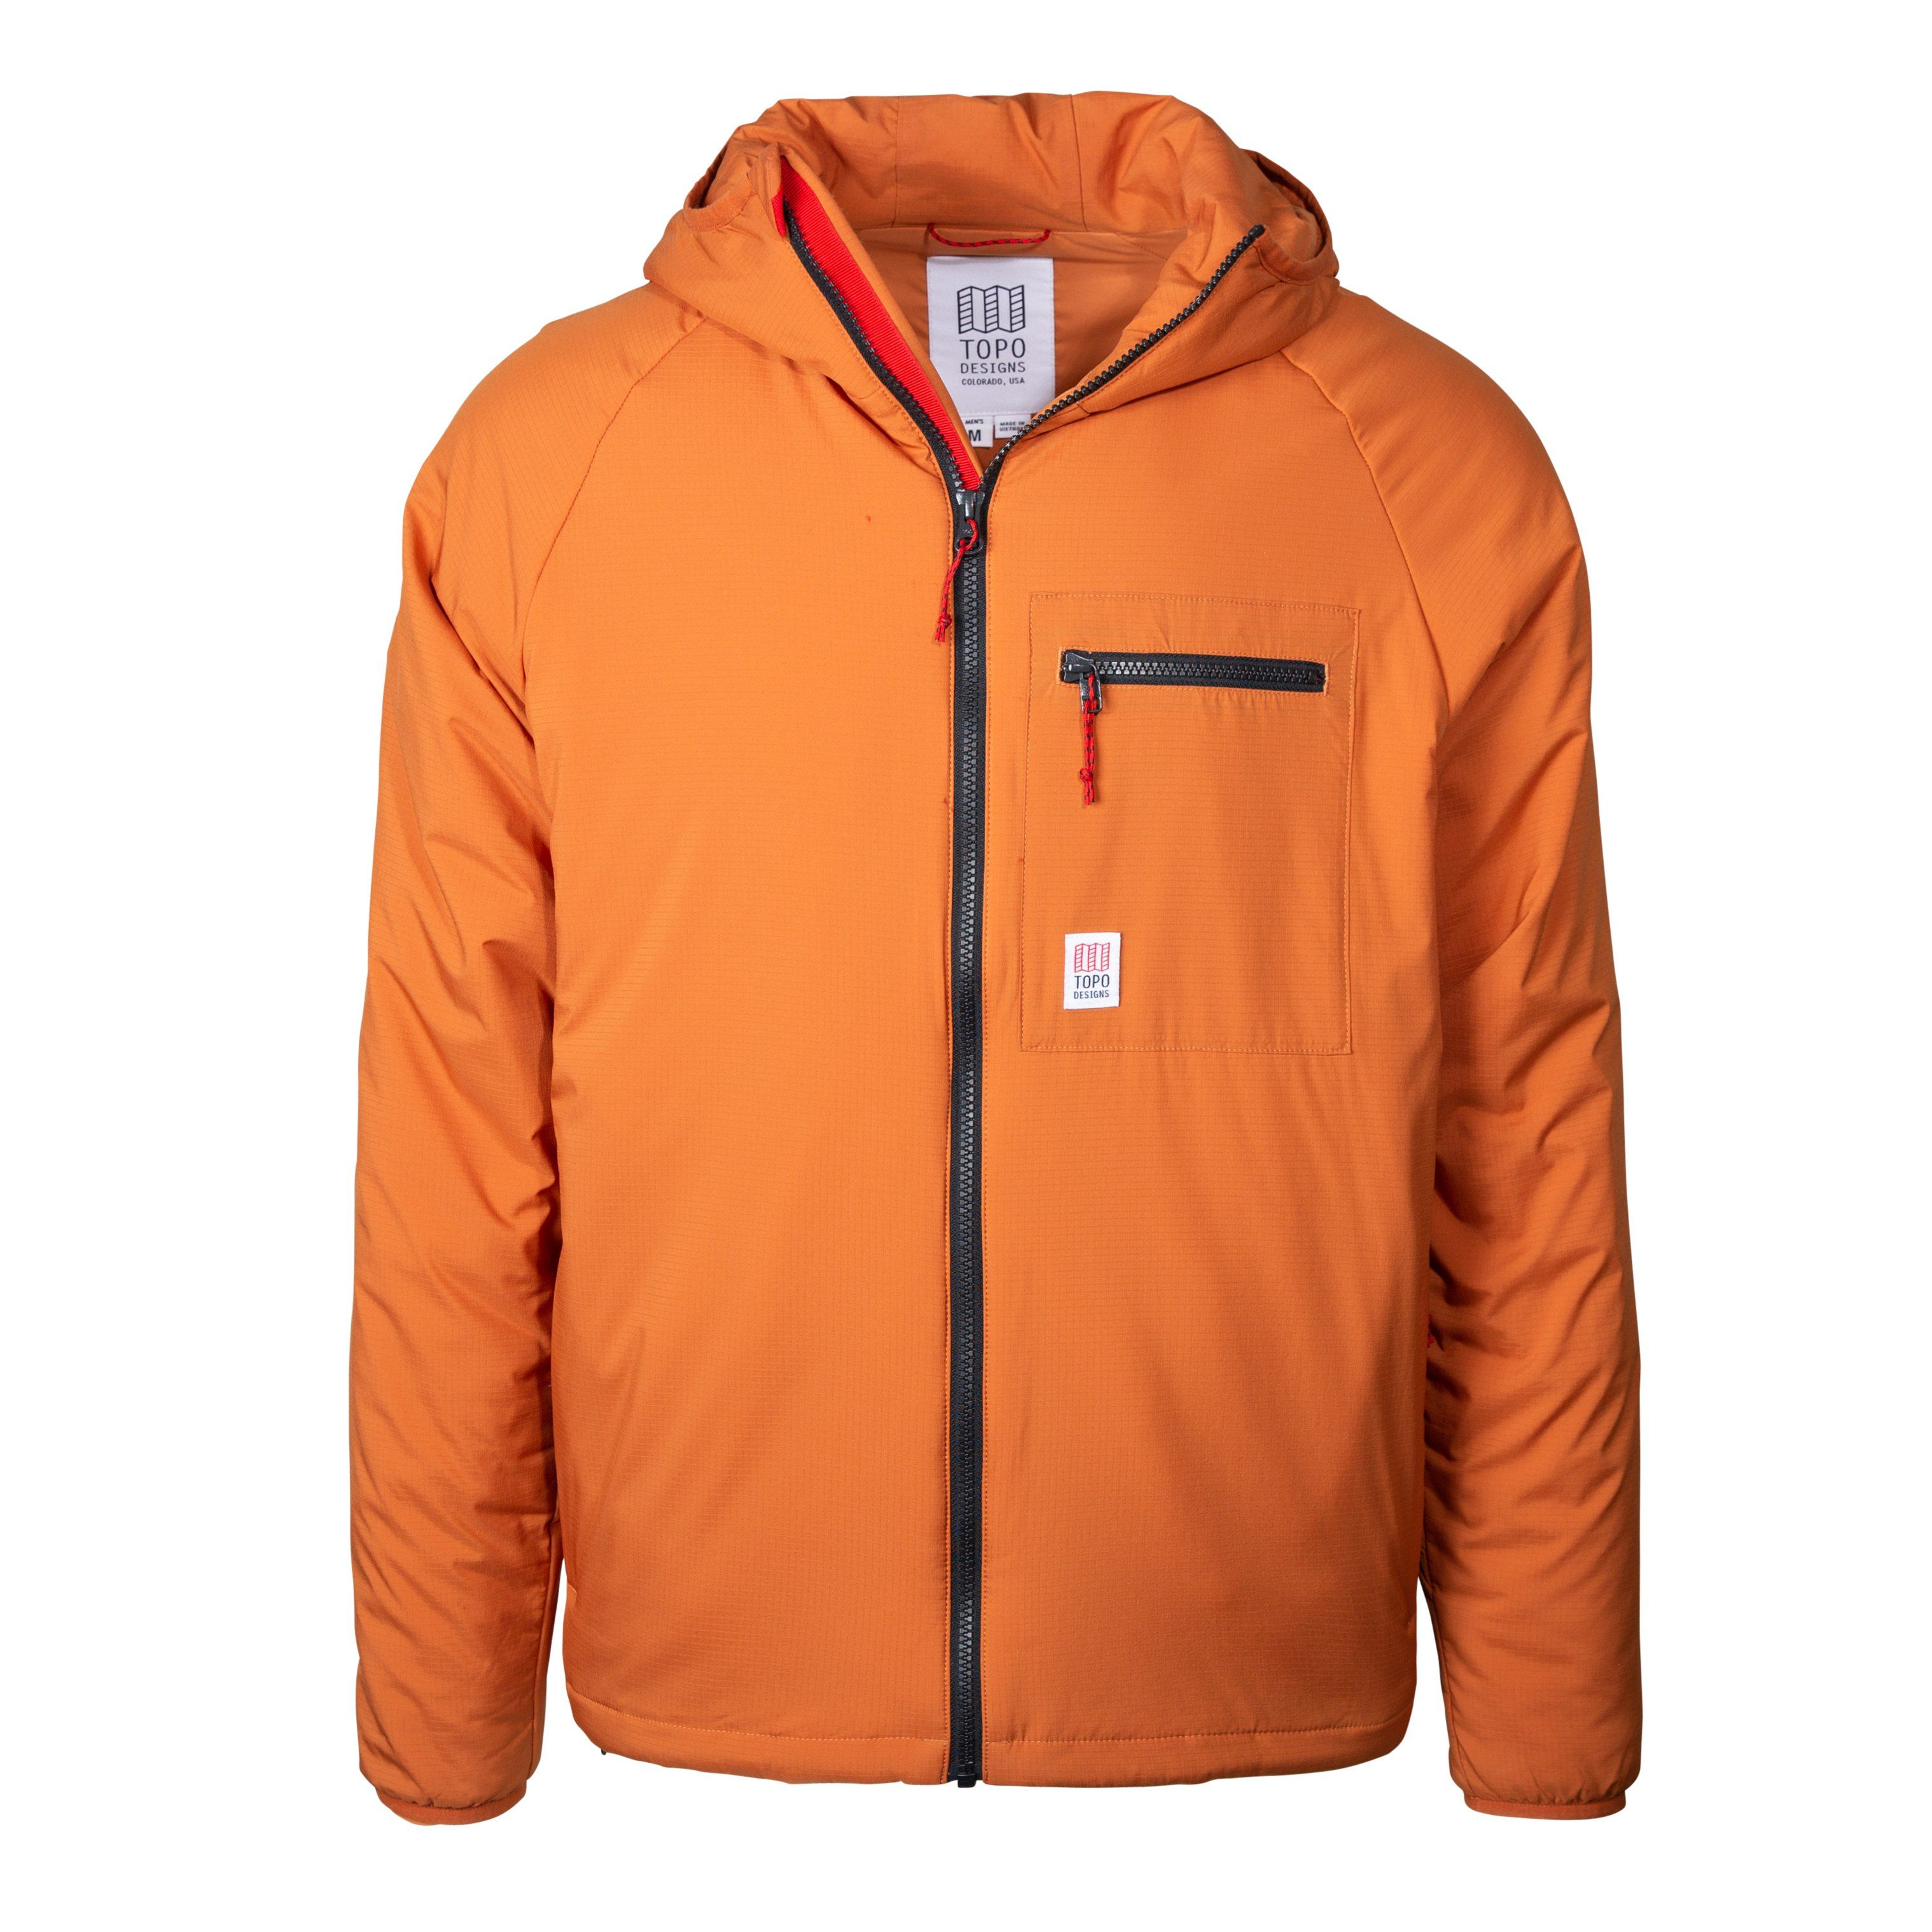 ERHETUS Mens Jackets Coats Fashionable 2020 Warm Insulation Coat Hoodie Sweatshirt Windbreaker